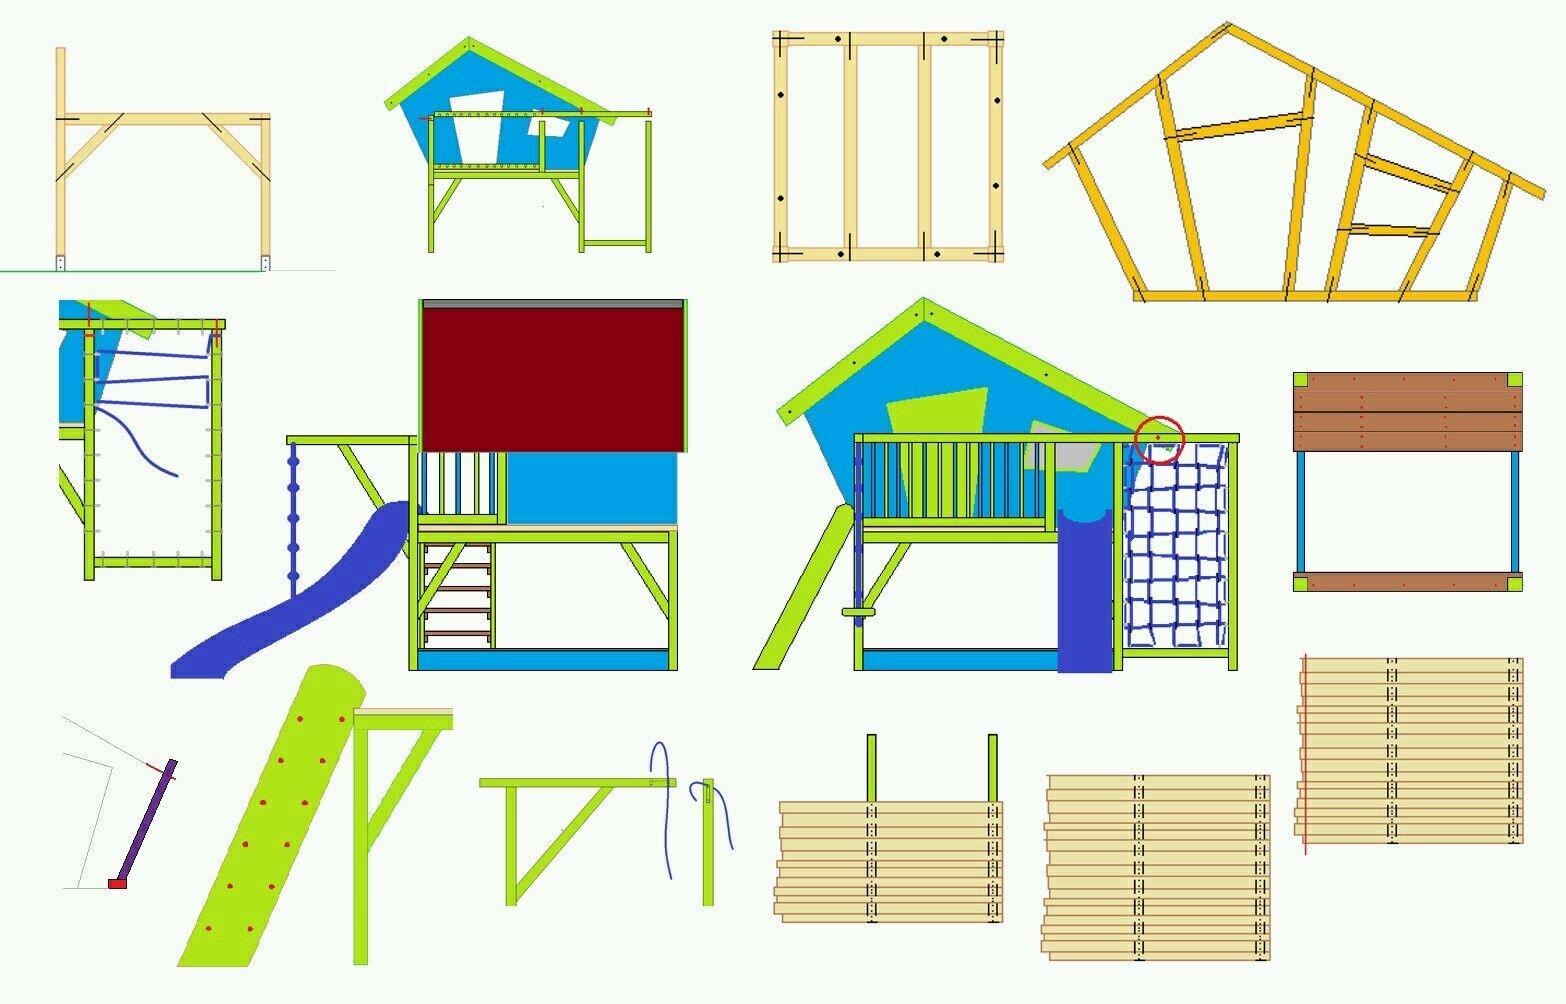 bauanleitung bauplan f r spielhaus stelzenhaus kinder gartenhaus pdf dateien neu eur 12 00. Black Bedroom Furniture Sets. Home Design Ideas